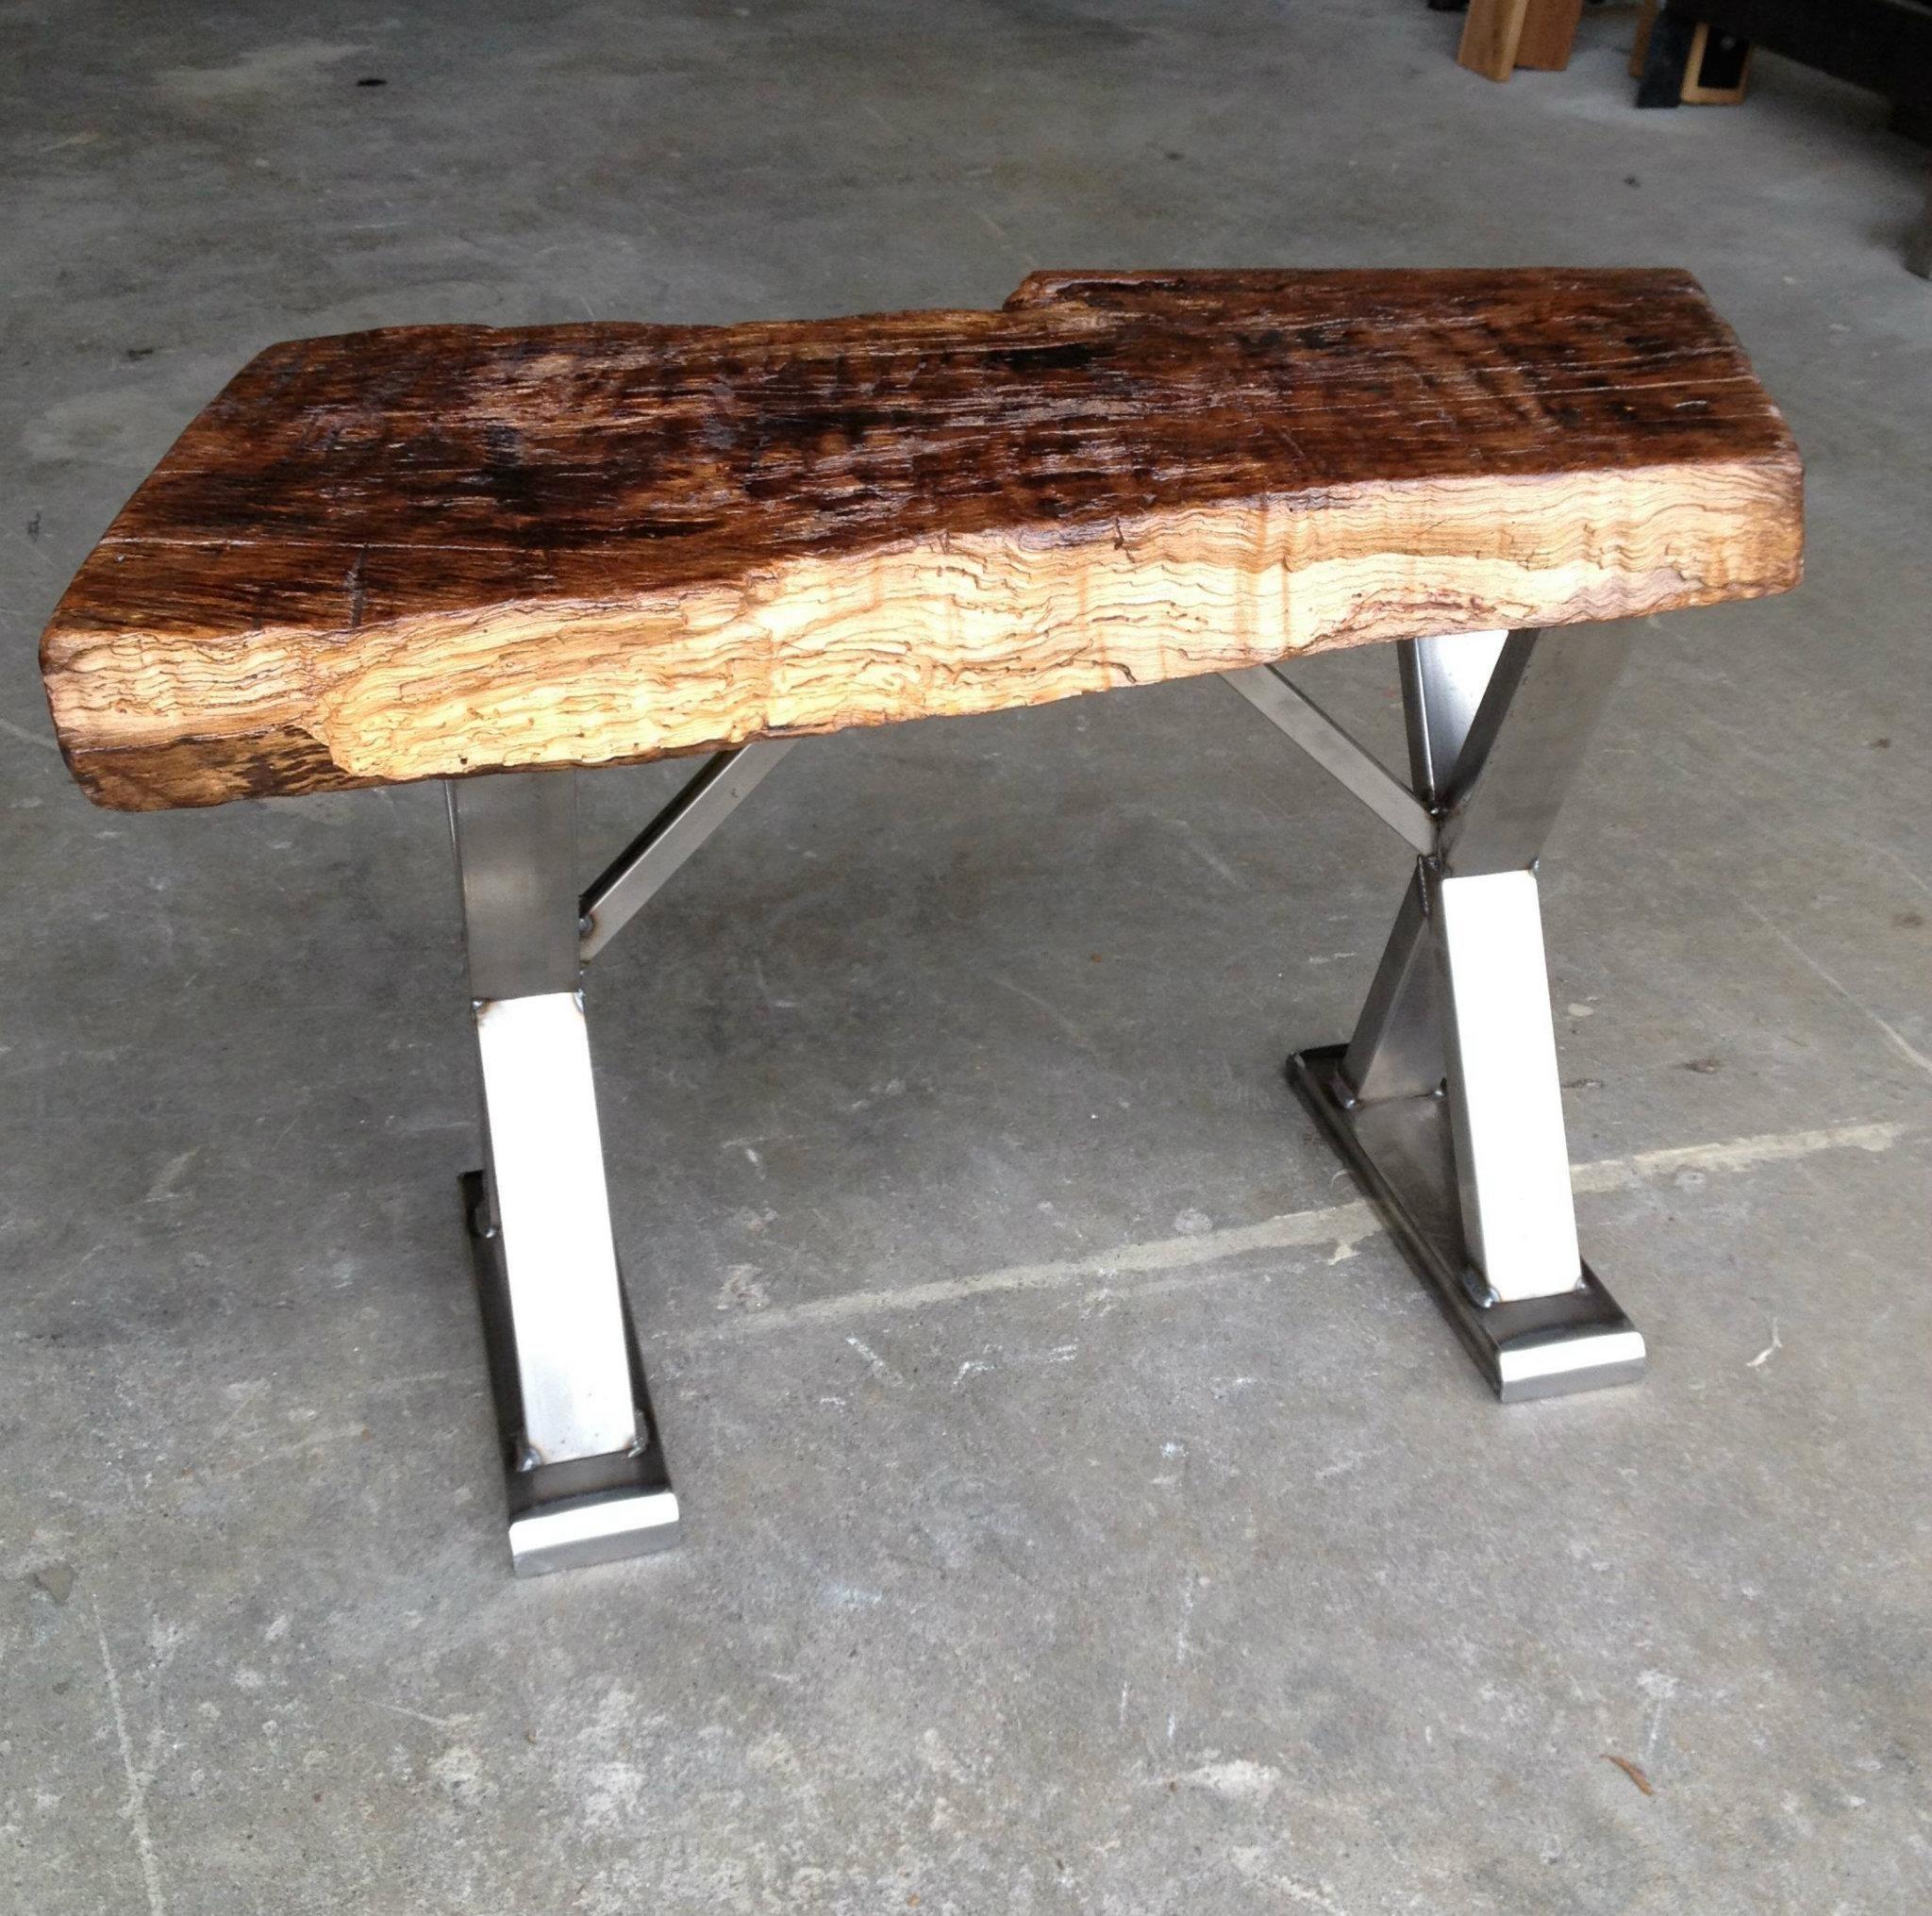 Well Liked Chrome Cross X Base Legs Reclaimed Wood Table On Gray Concrete  Floors As